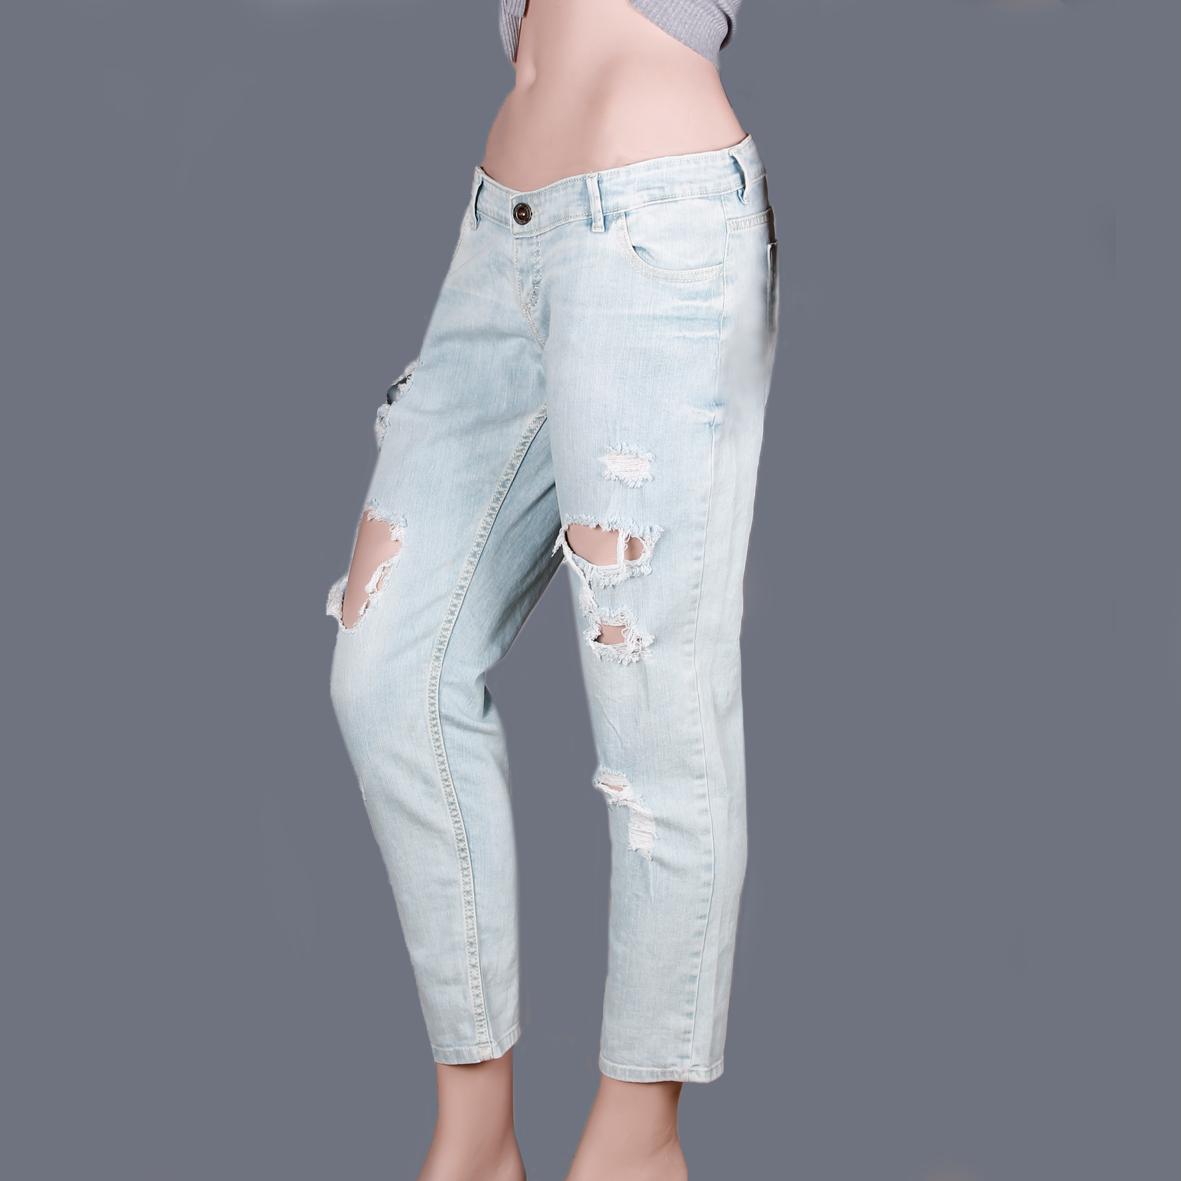 شلوار جین زاپ دار Dsquared